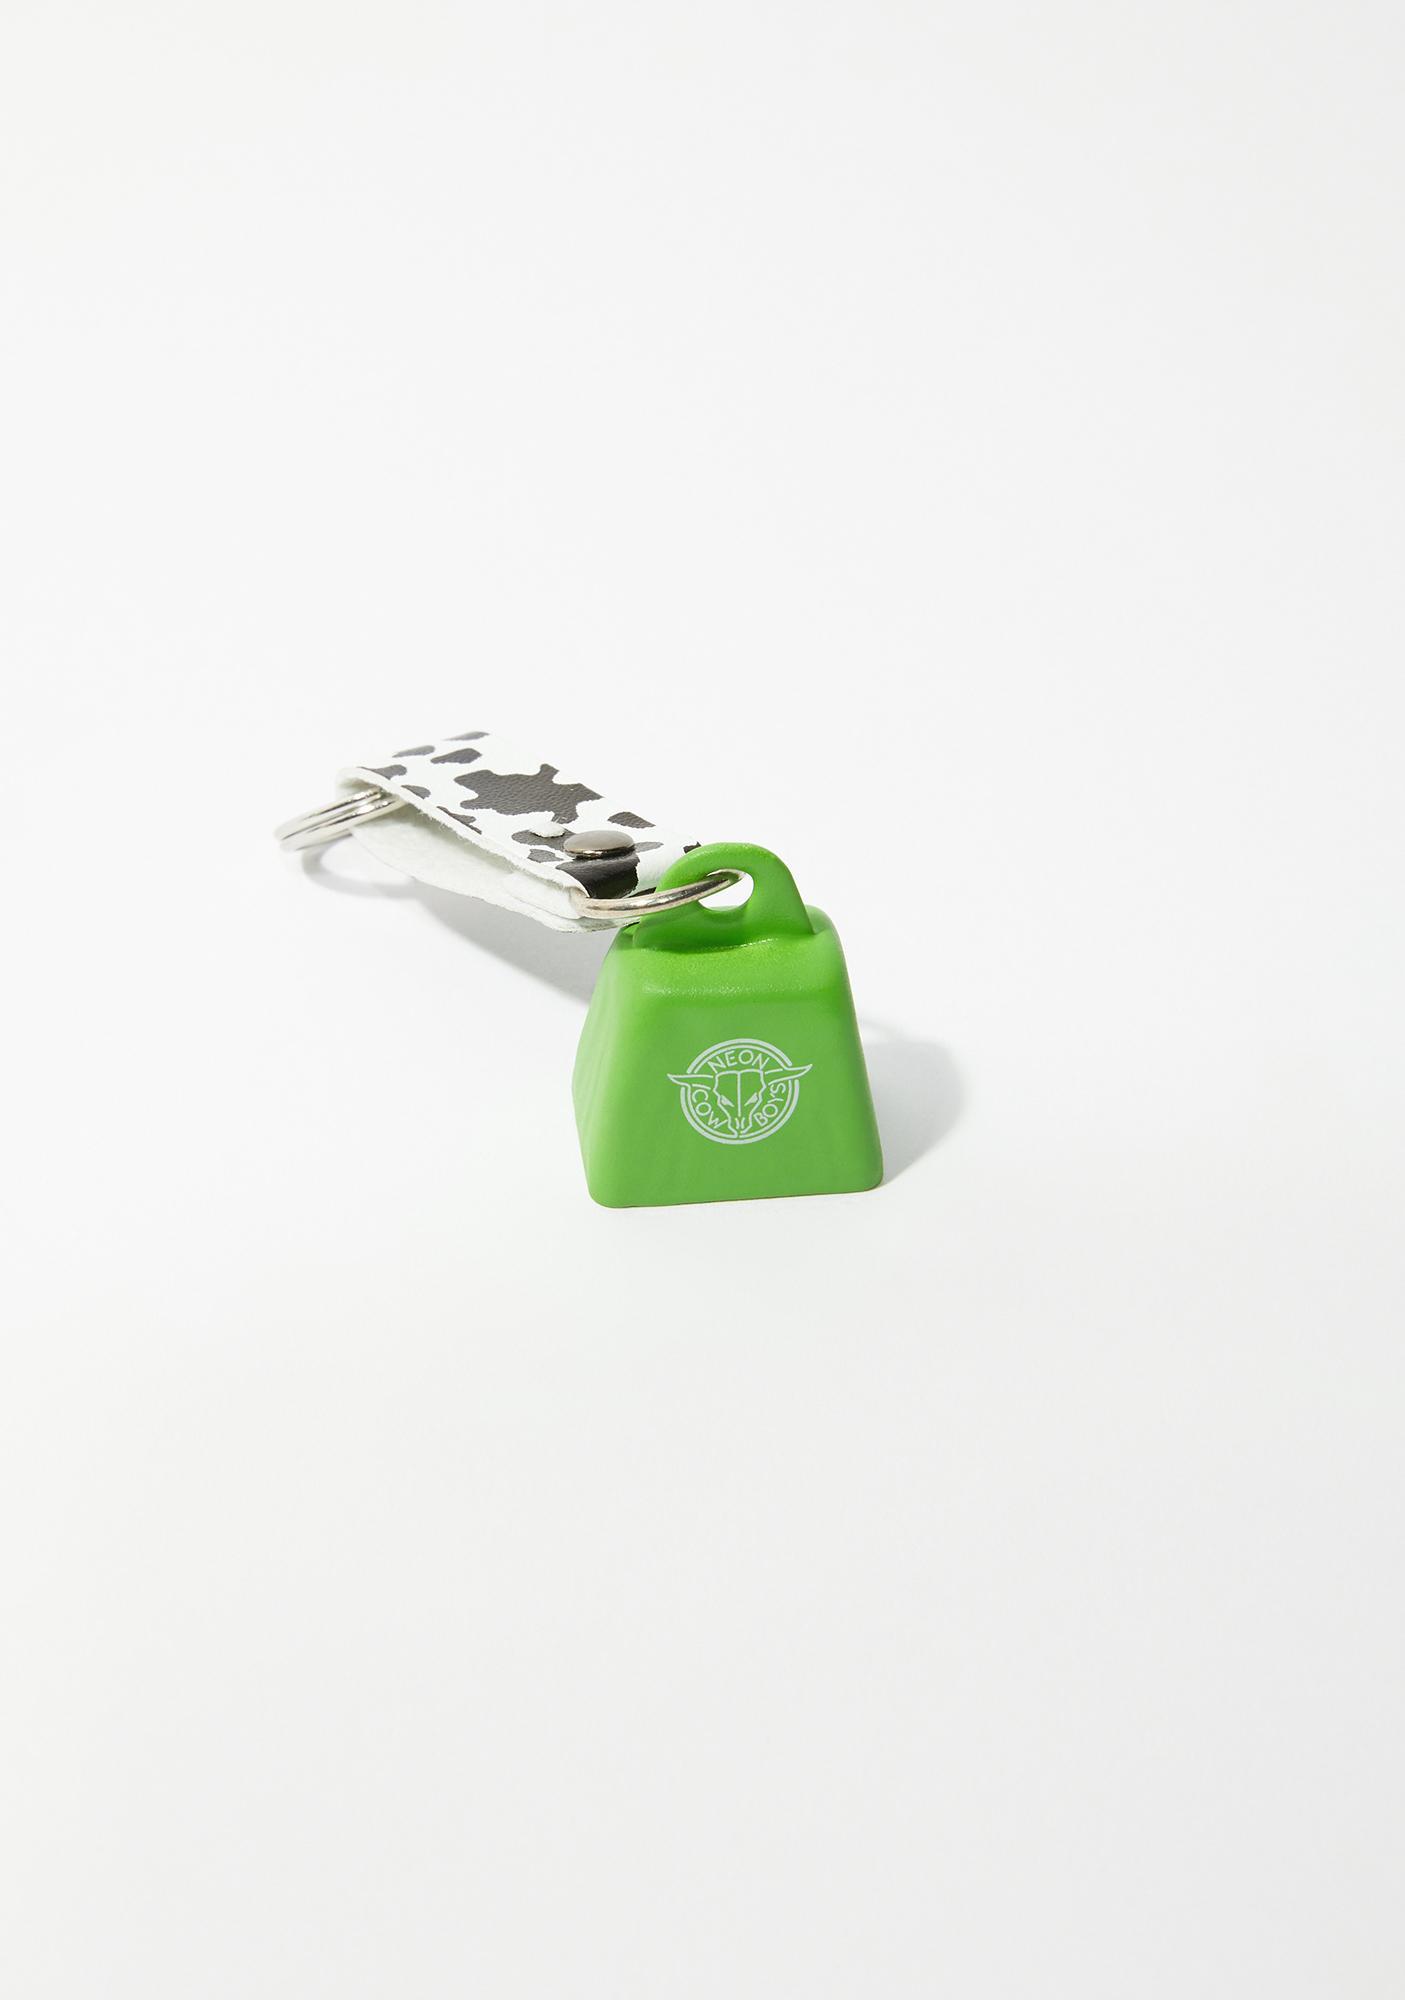 Neon Cowboys Green Mini Cowbell Keychain